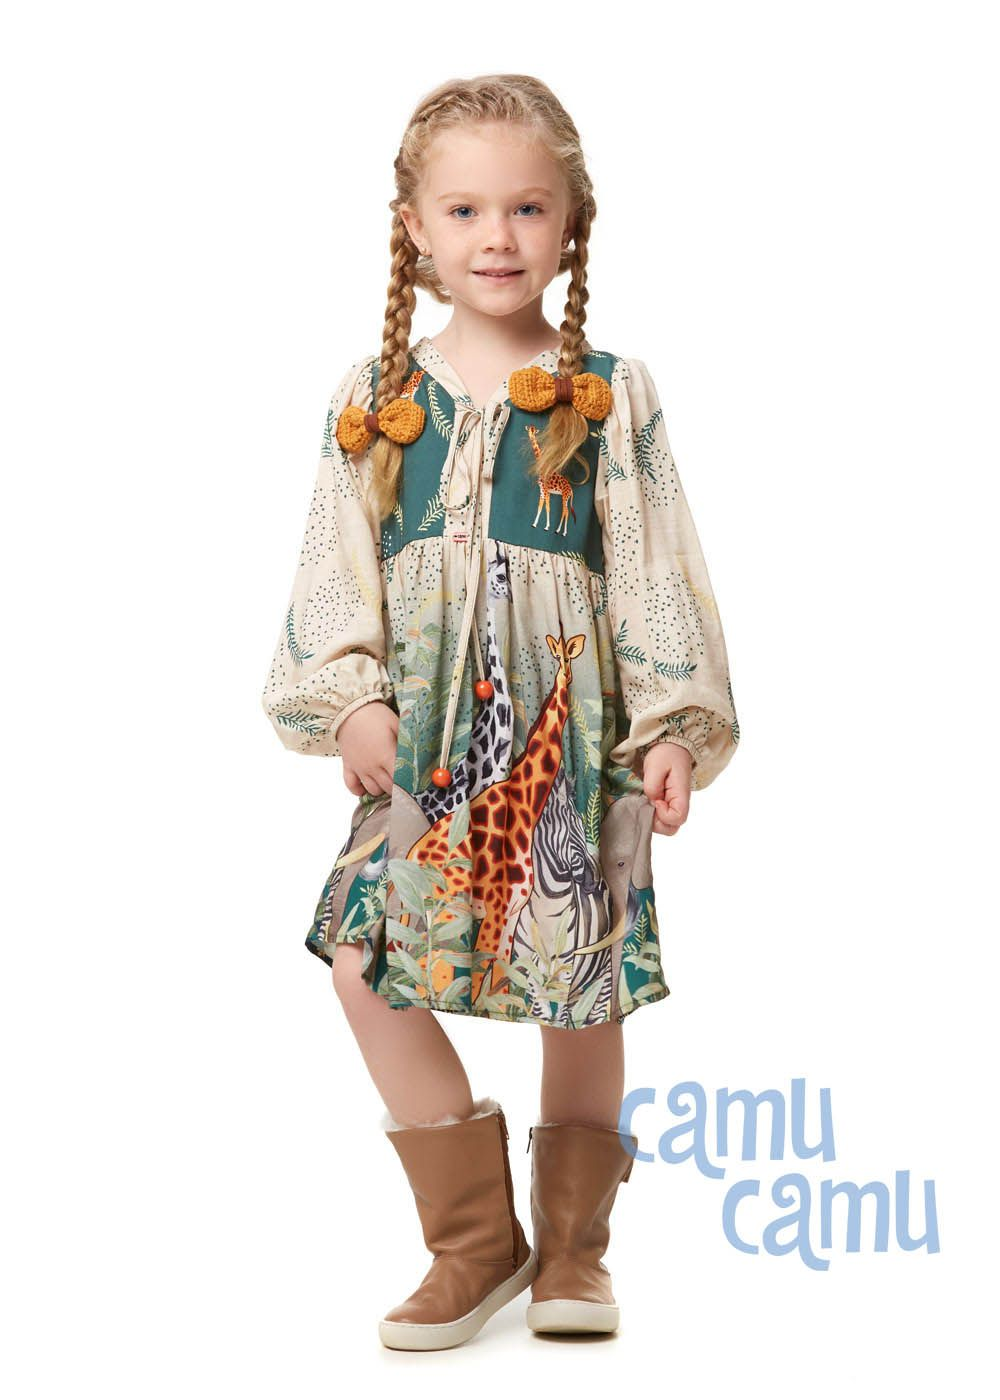 Vestido Camu Camu Feminino Girafa Curto